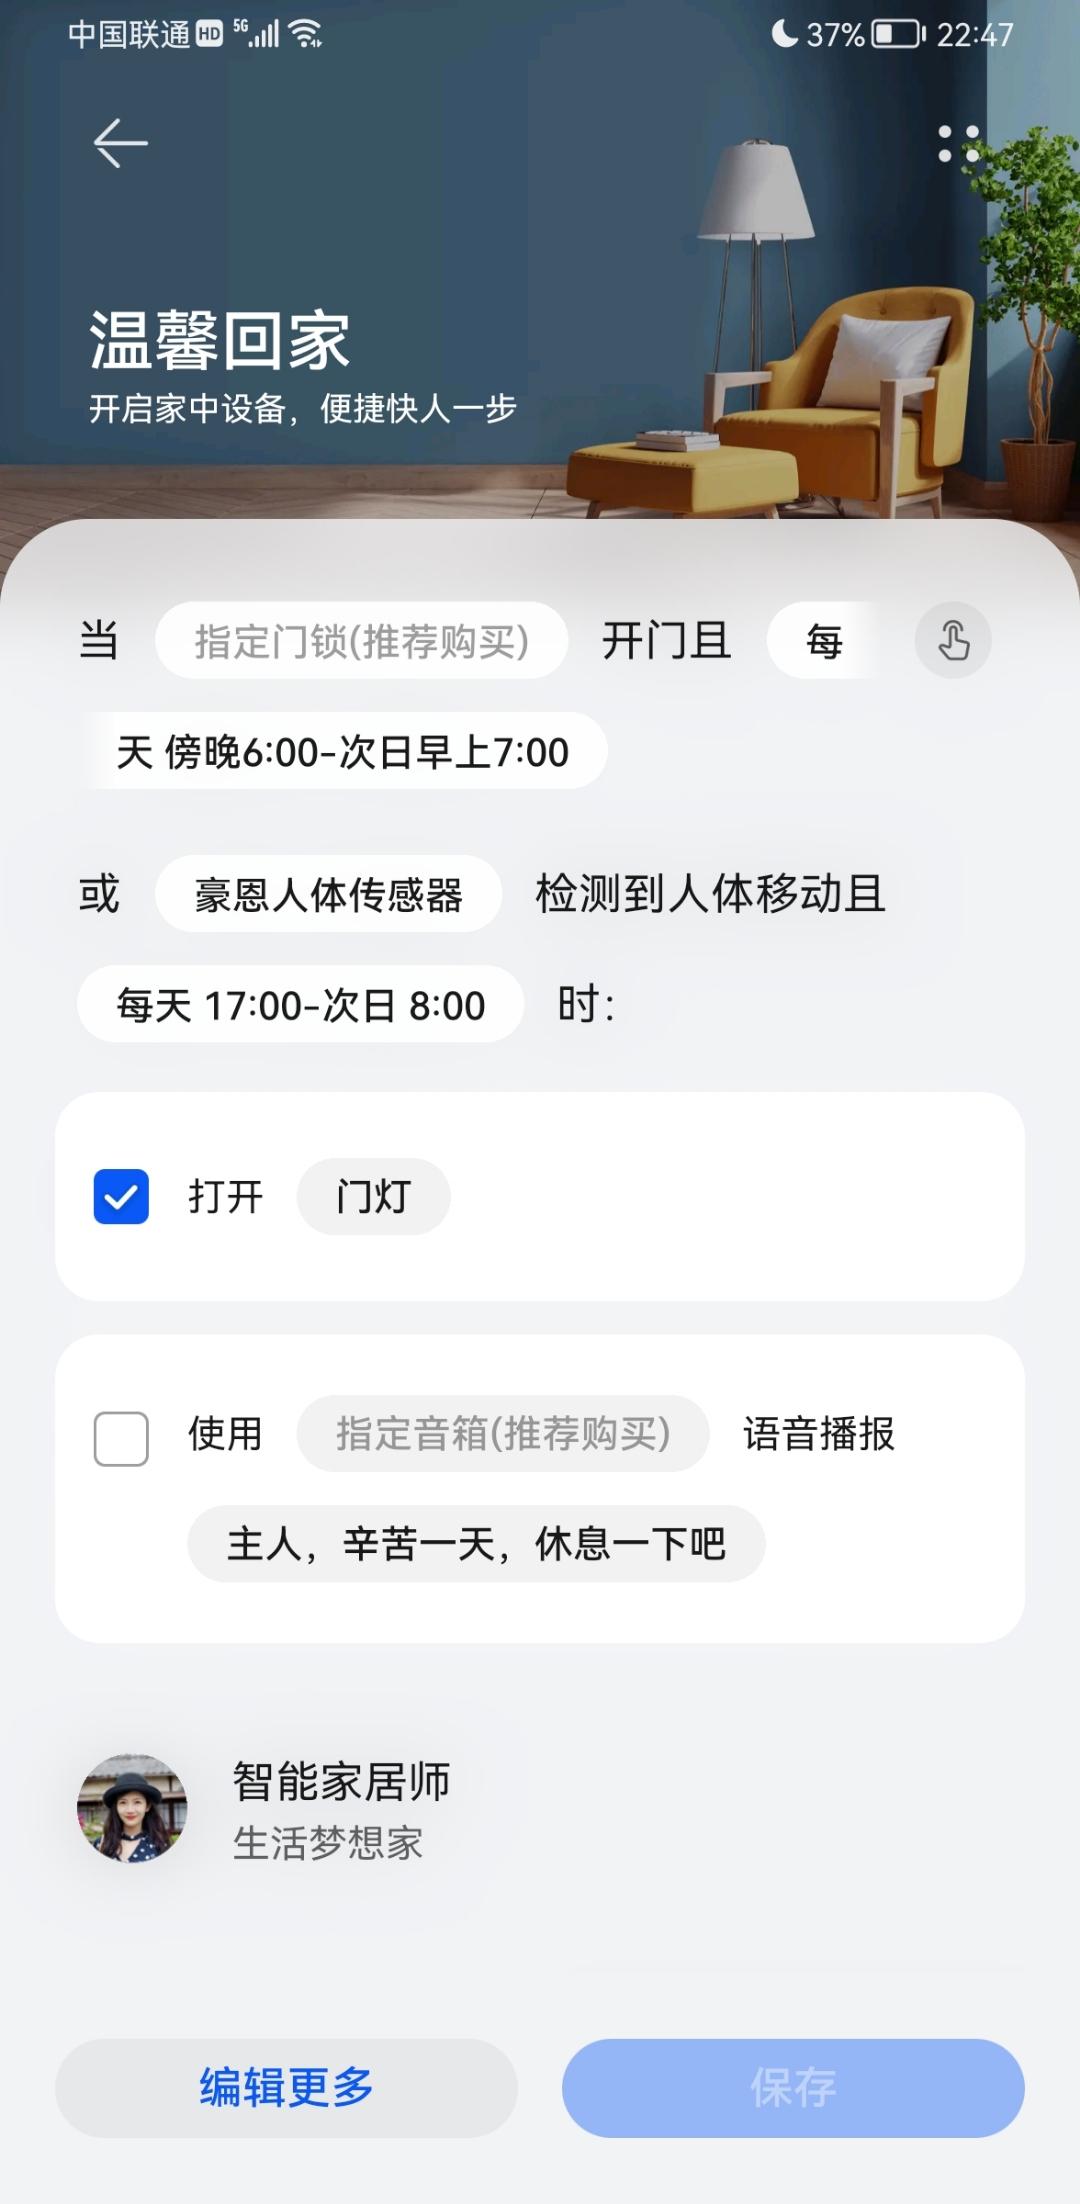 Screenshot_20210912_224729_com.huawei.smarthome.jpg